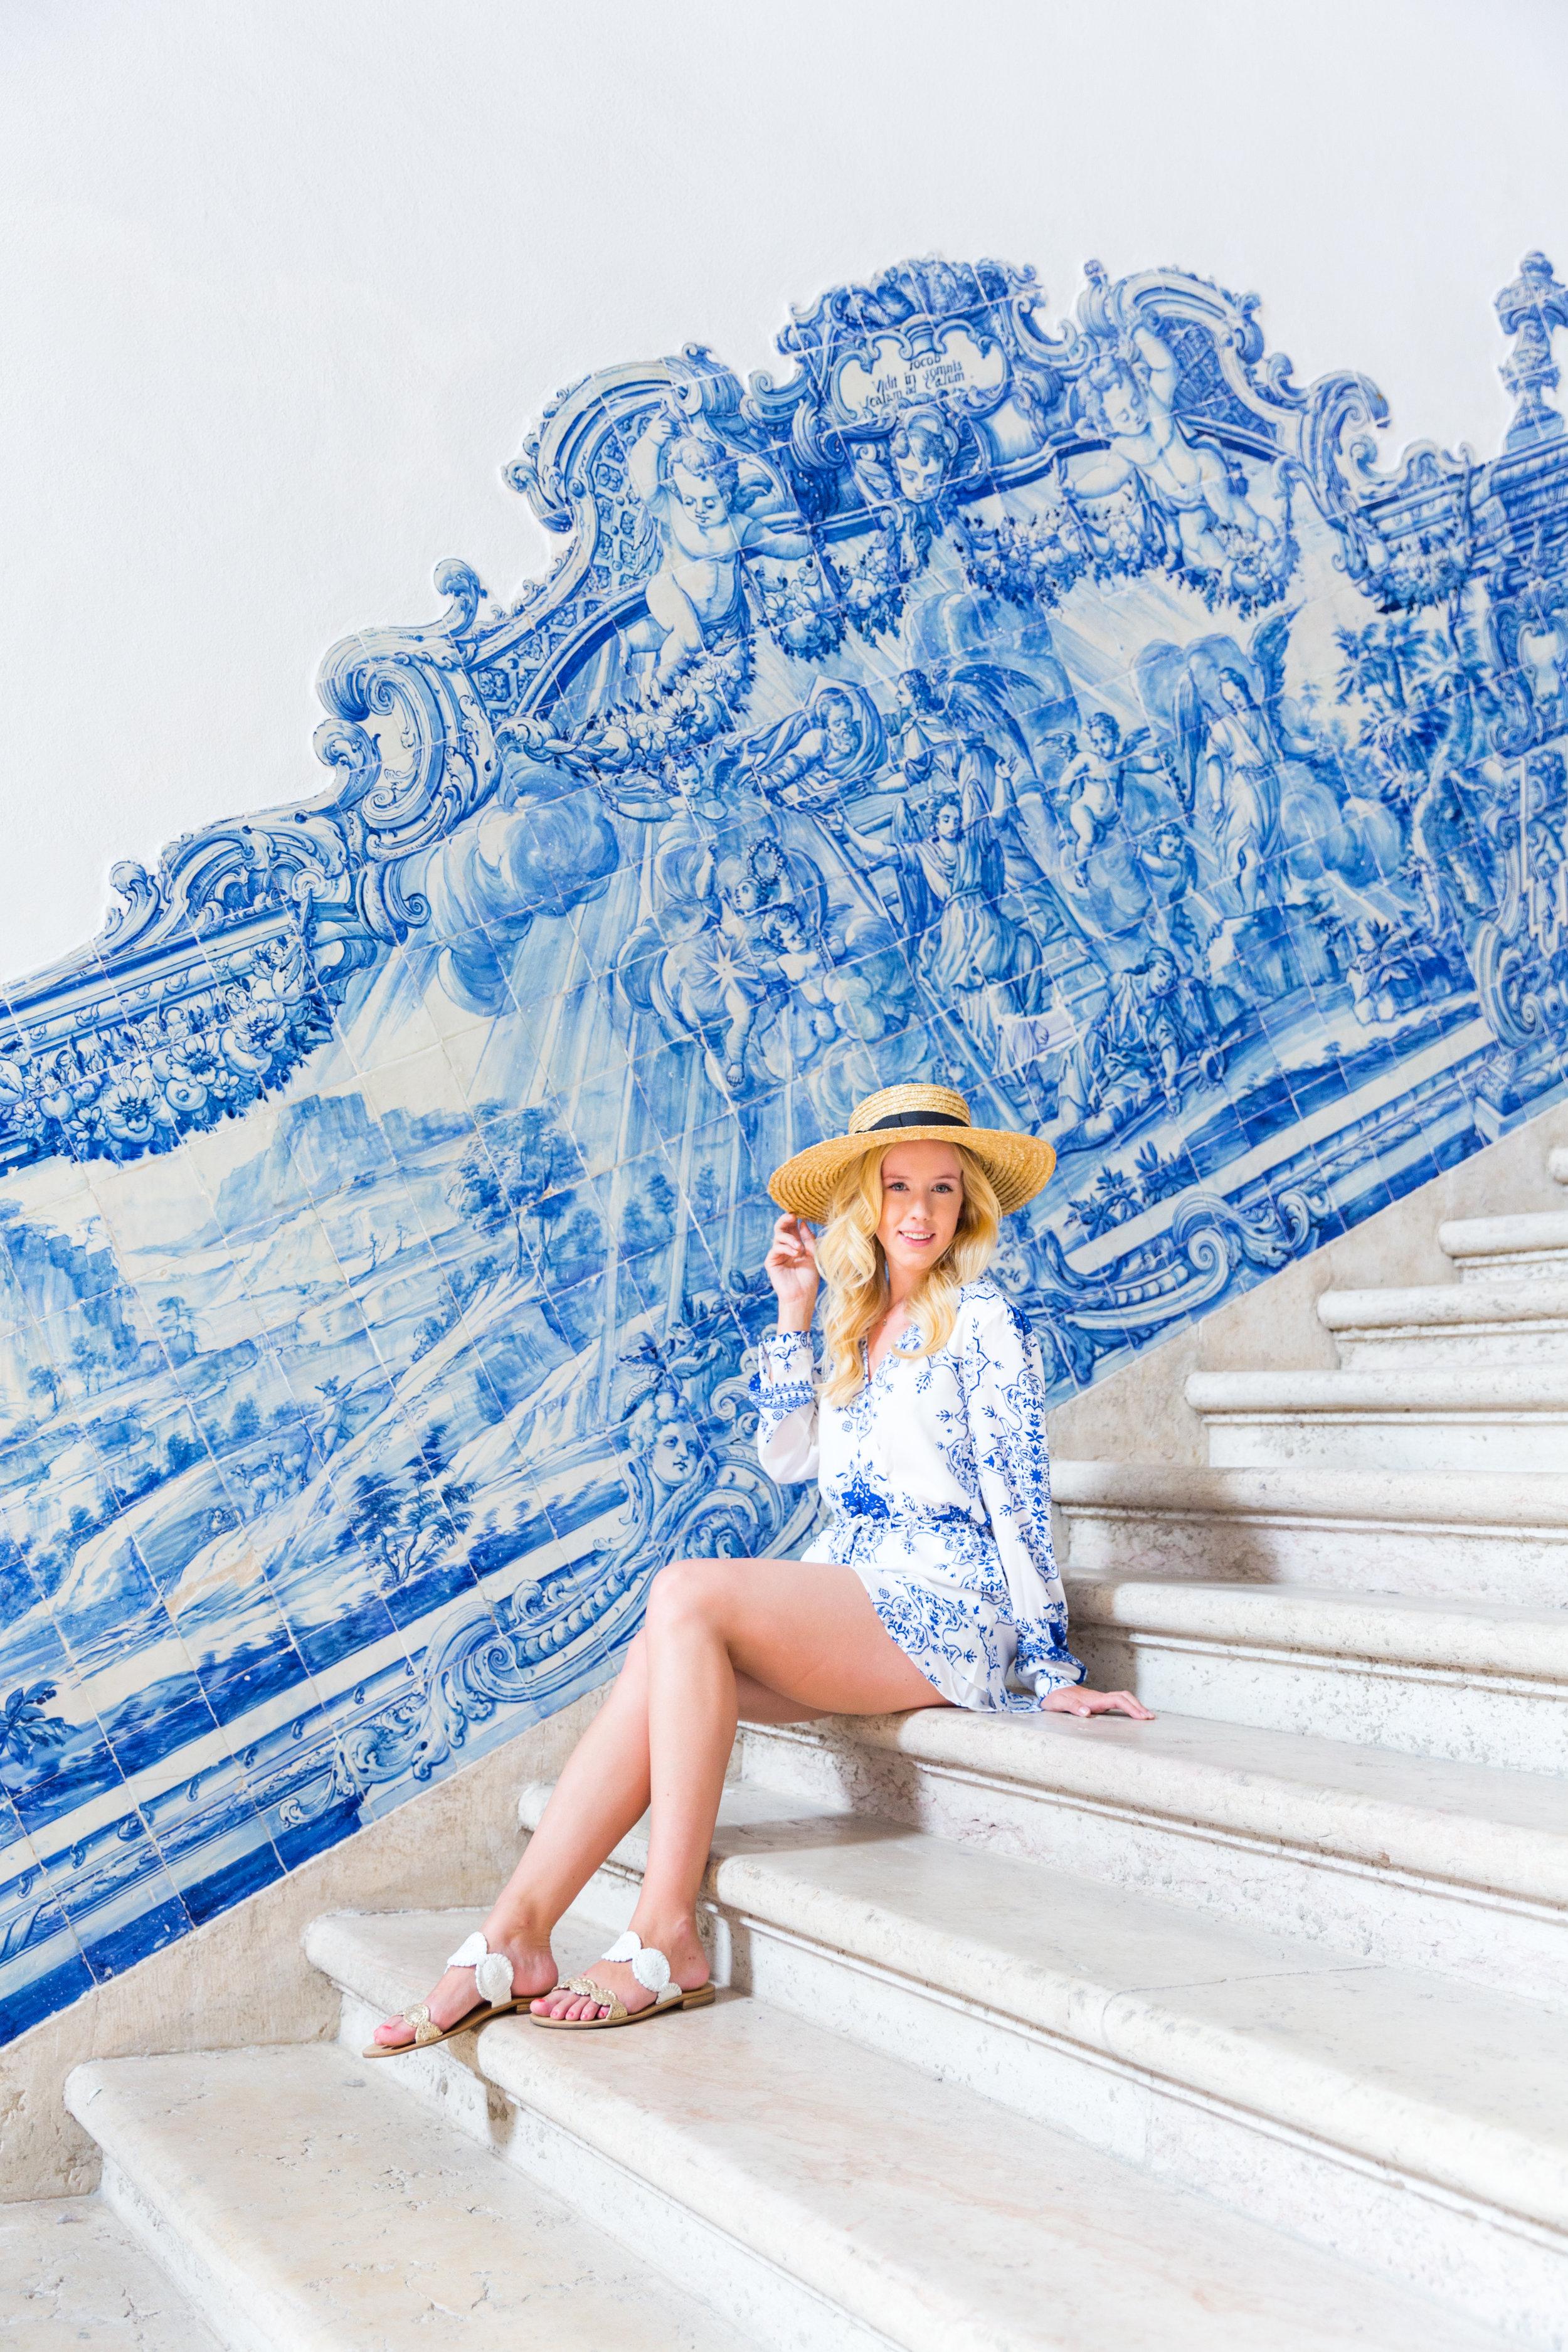 Lisbon Portugal Summer Blue and White Romper Fashion_-4.jpg